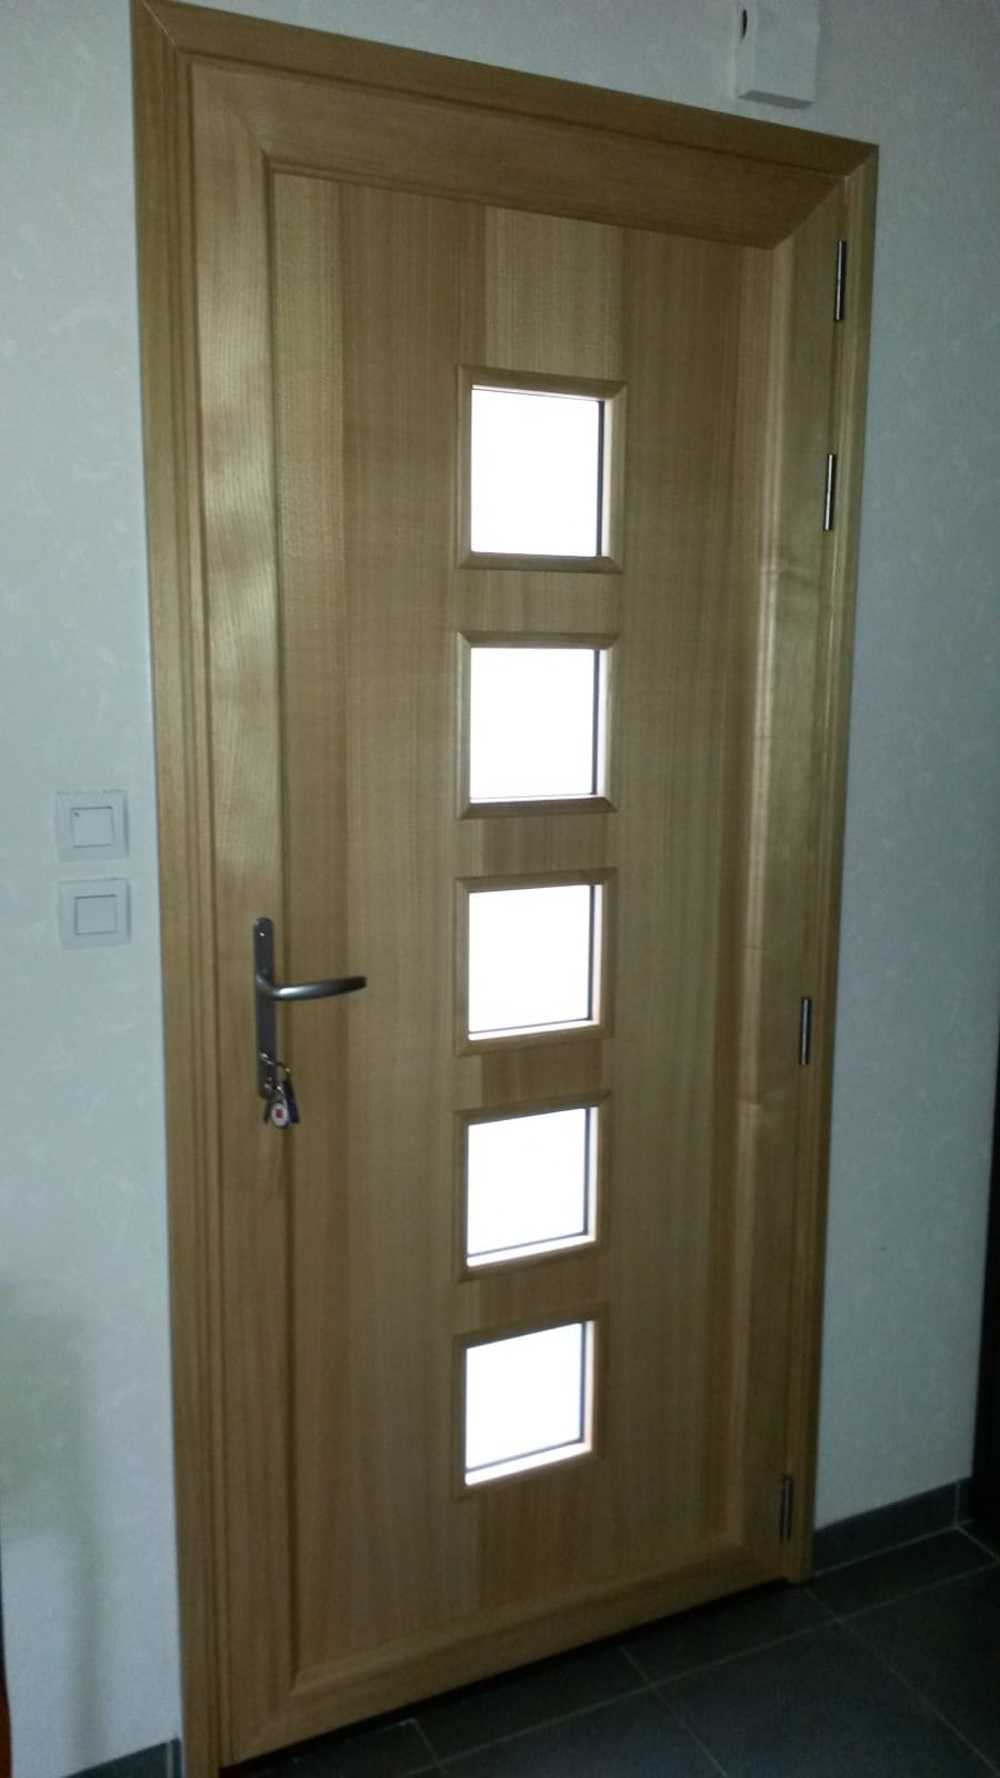 Porte d''entrée moderne - aluminium - Dinan 387e955b-17b9-49b9-8499-586f9c36e5b1